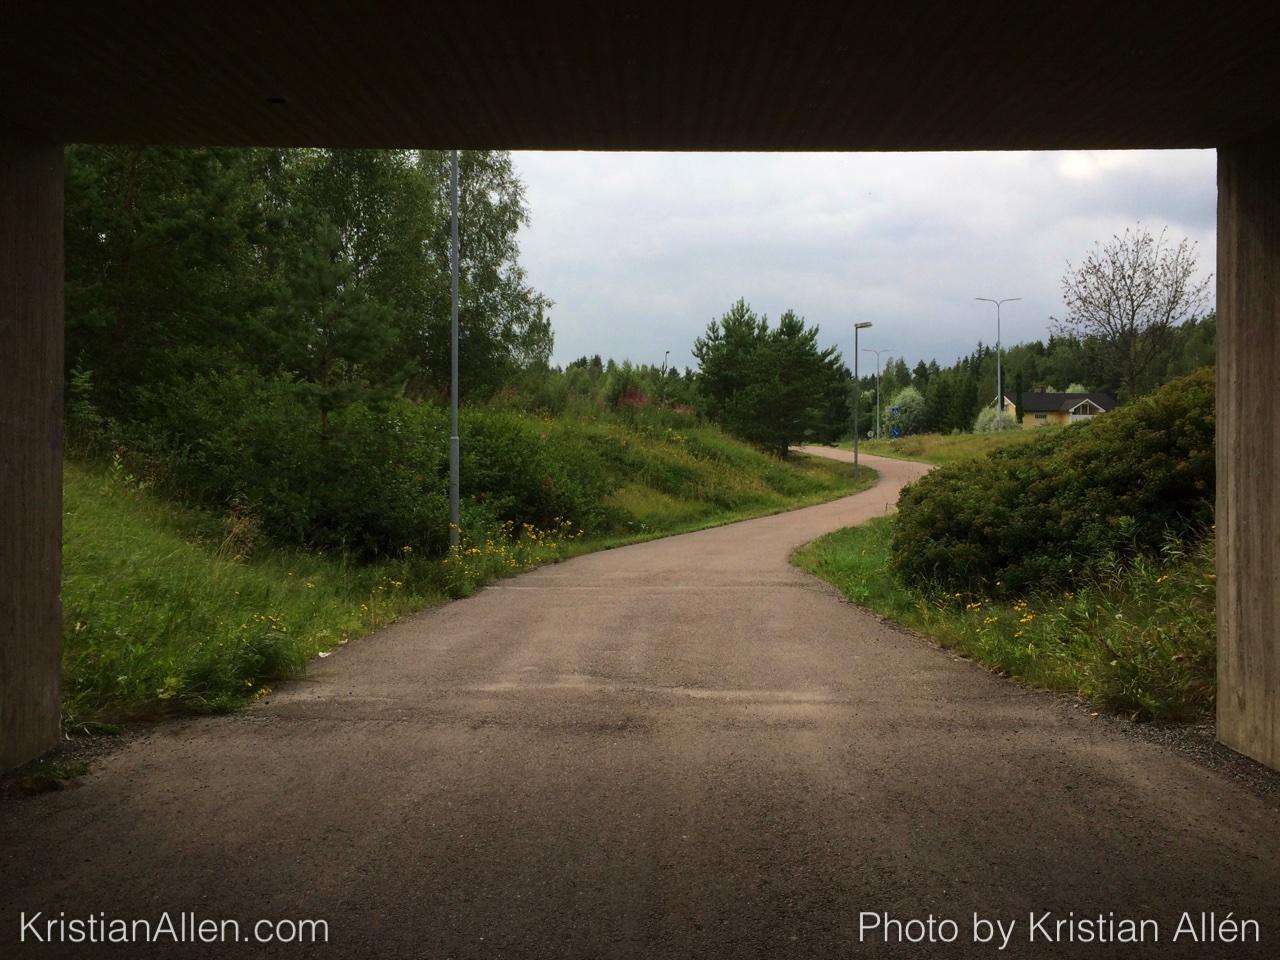 23.7.2016 21.17 km Run